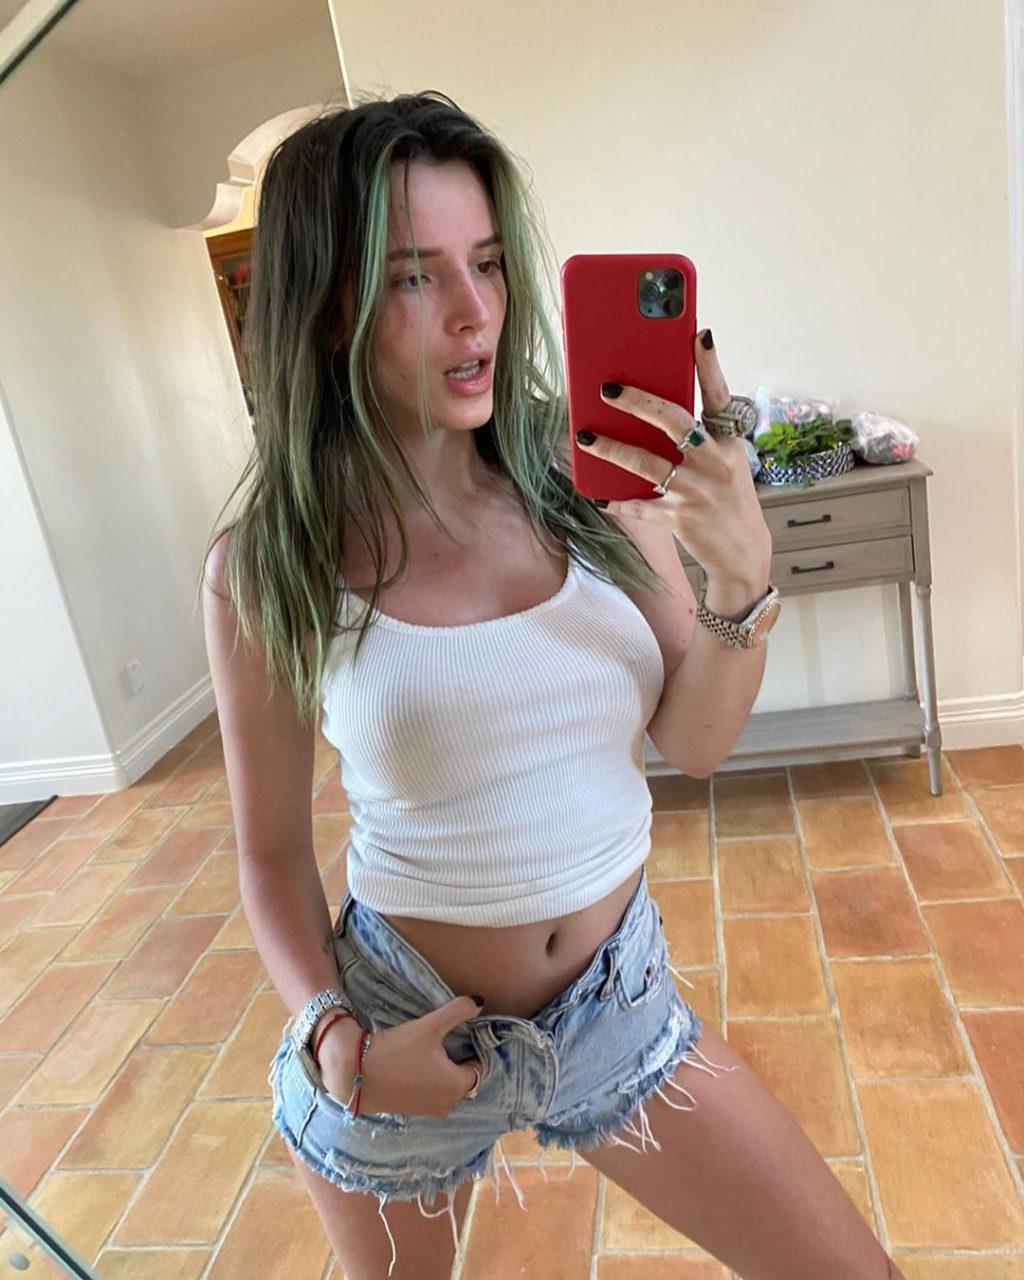 Annabella Thorne Sexy (4 Hot Photos)